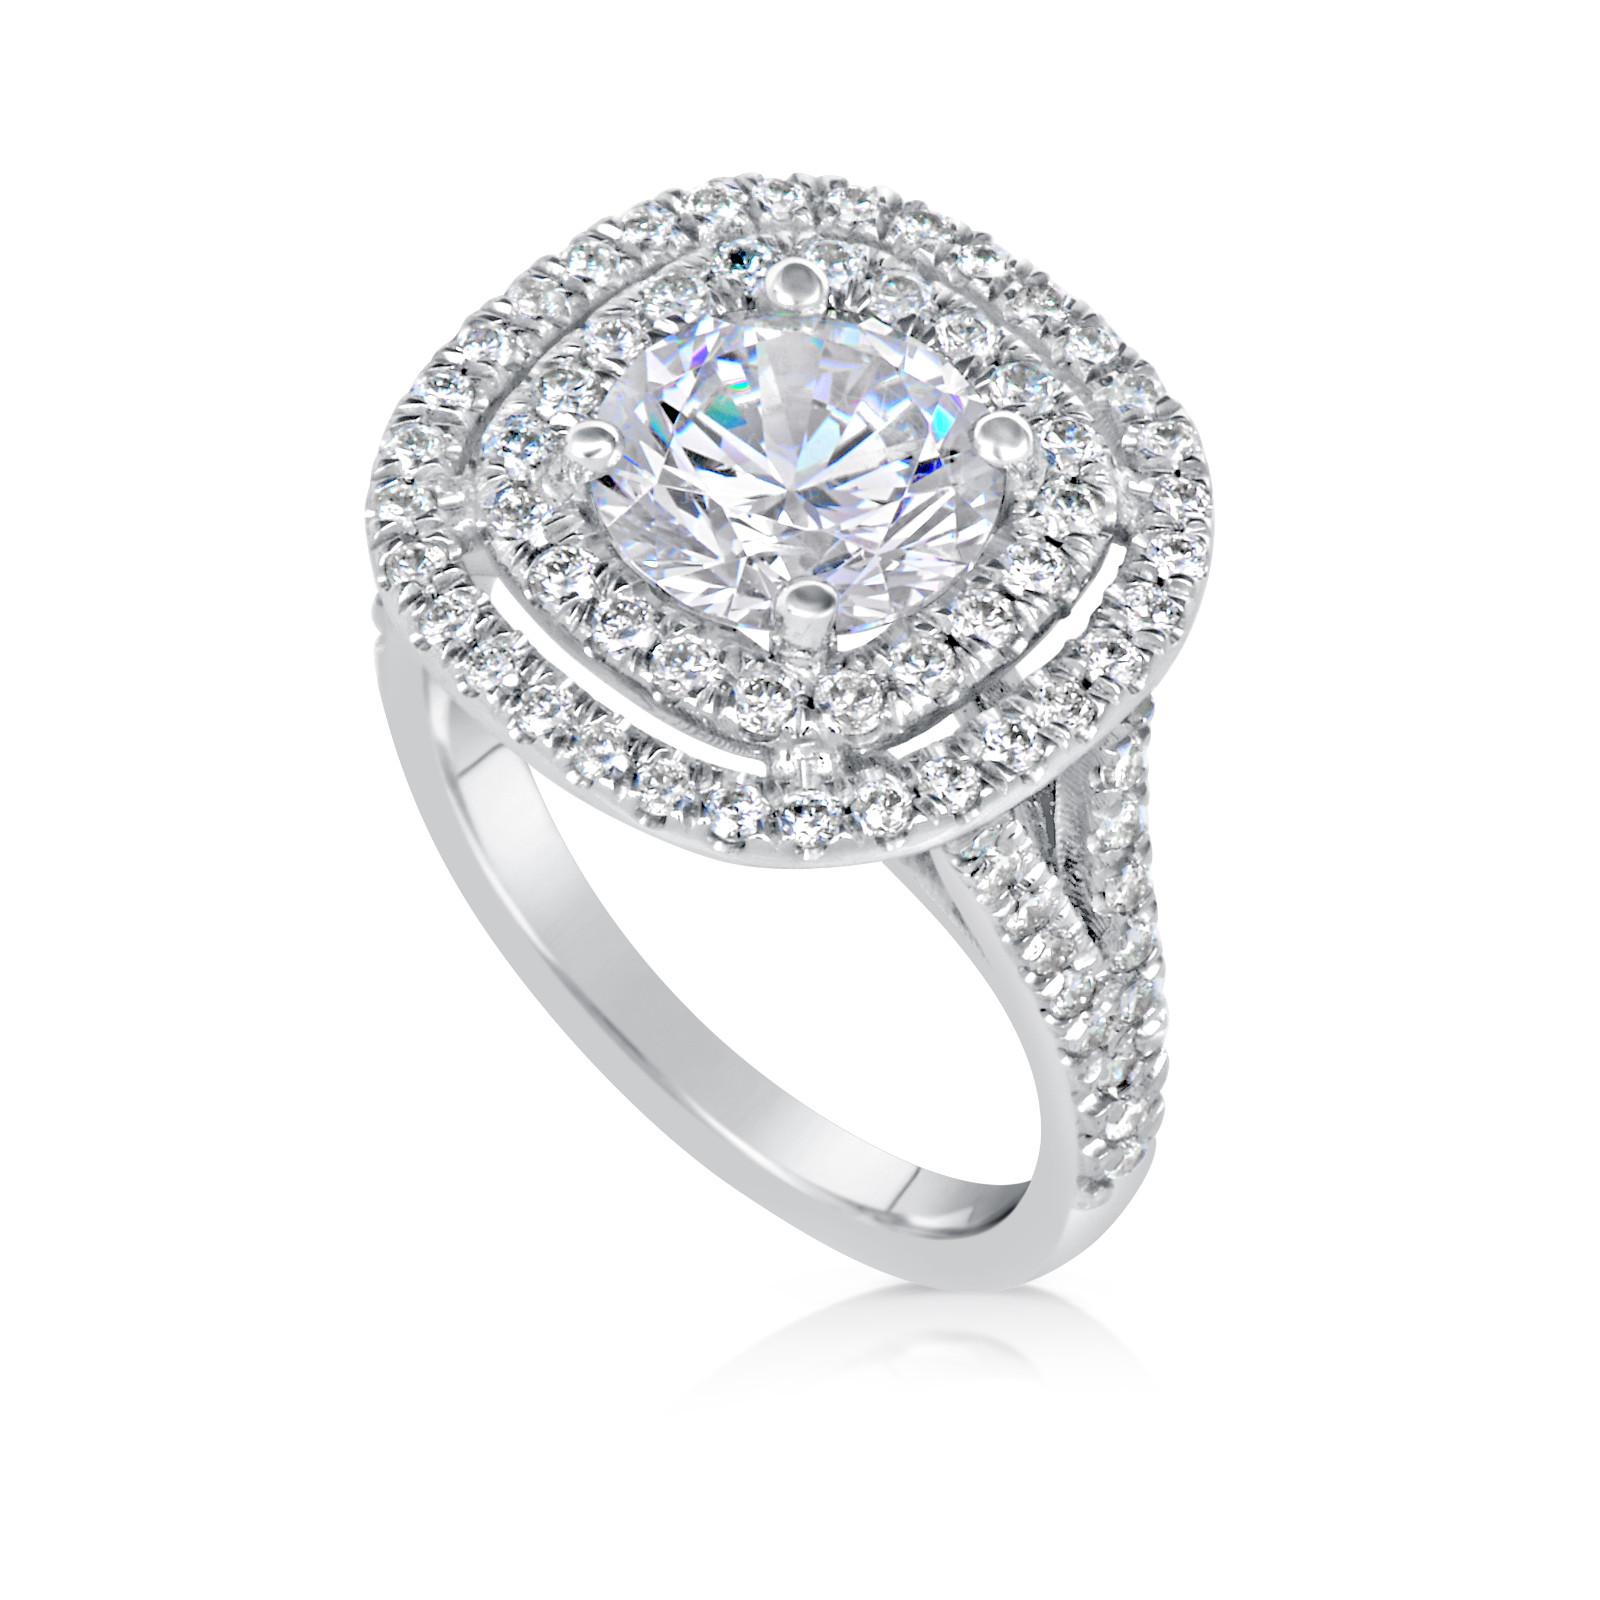 400 Ct Round Cut Dsi1 Diamond Solitaire Engagement Ring 14k White